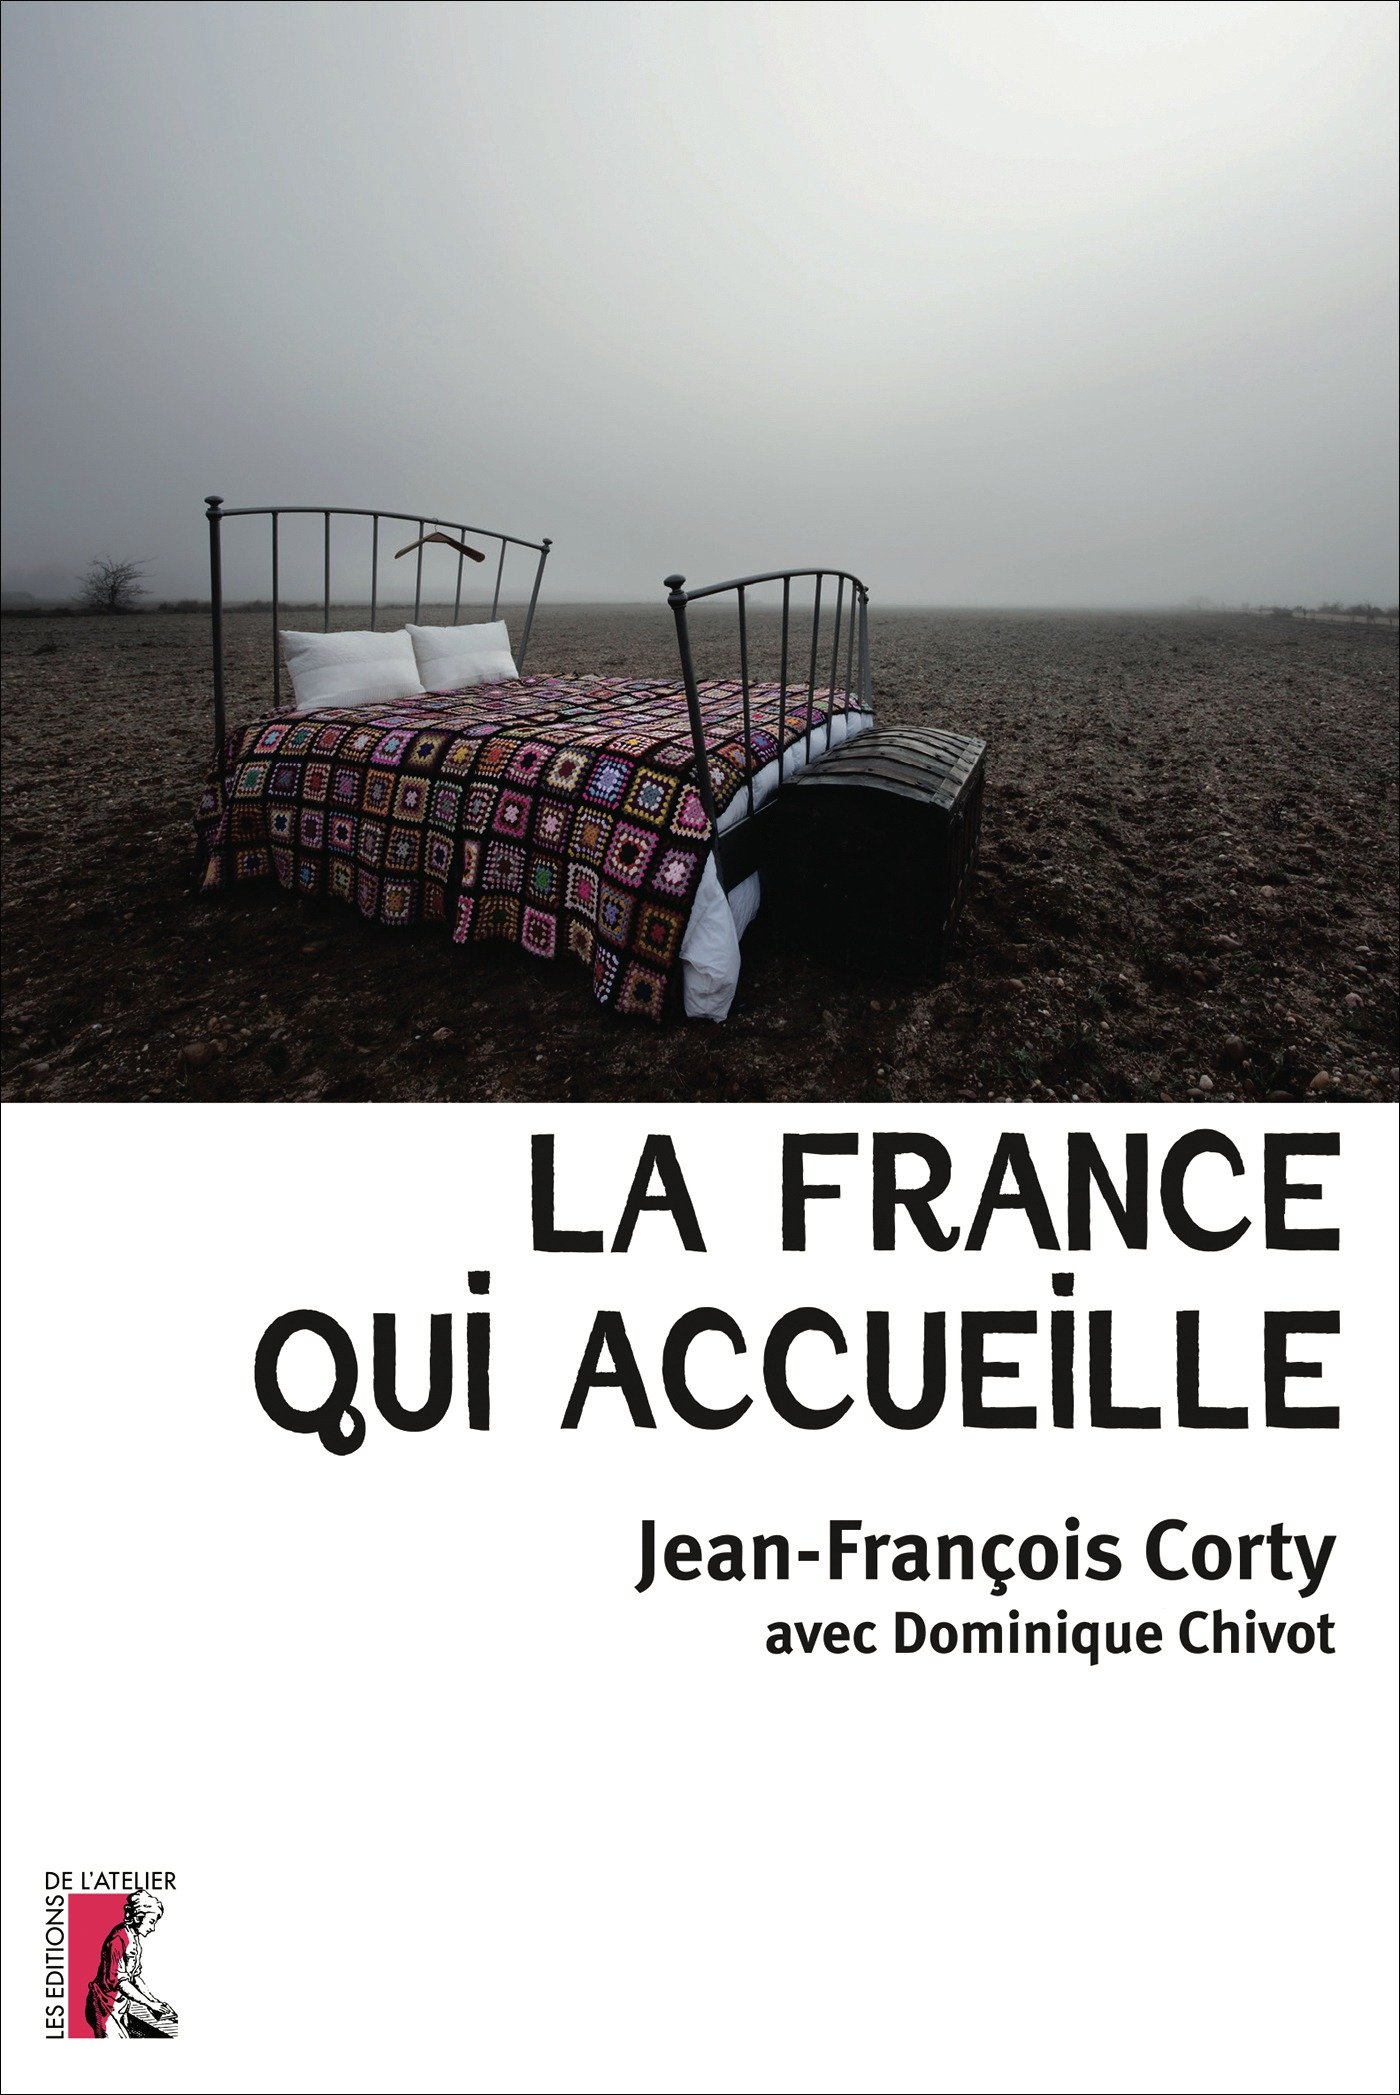 J.F. Corty: La France Qui Accueille